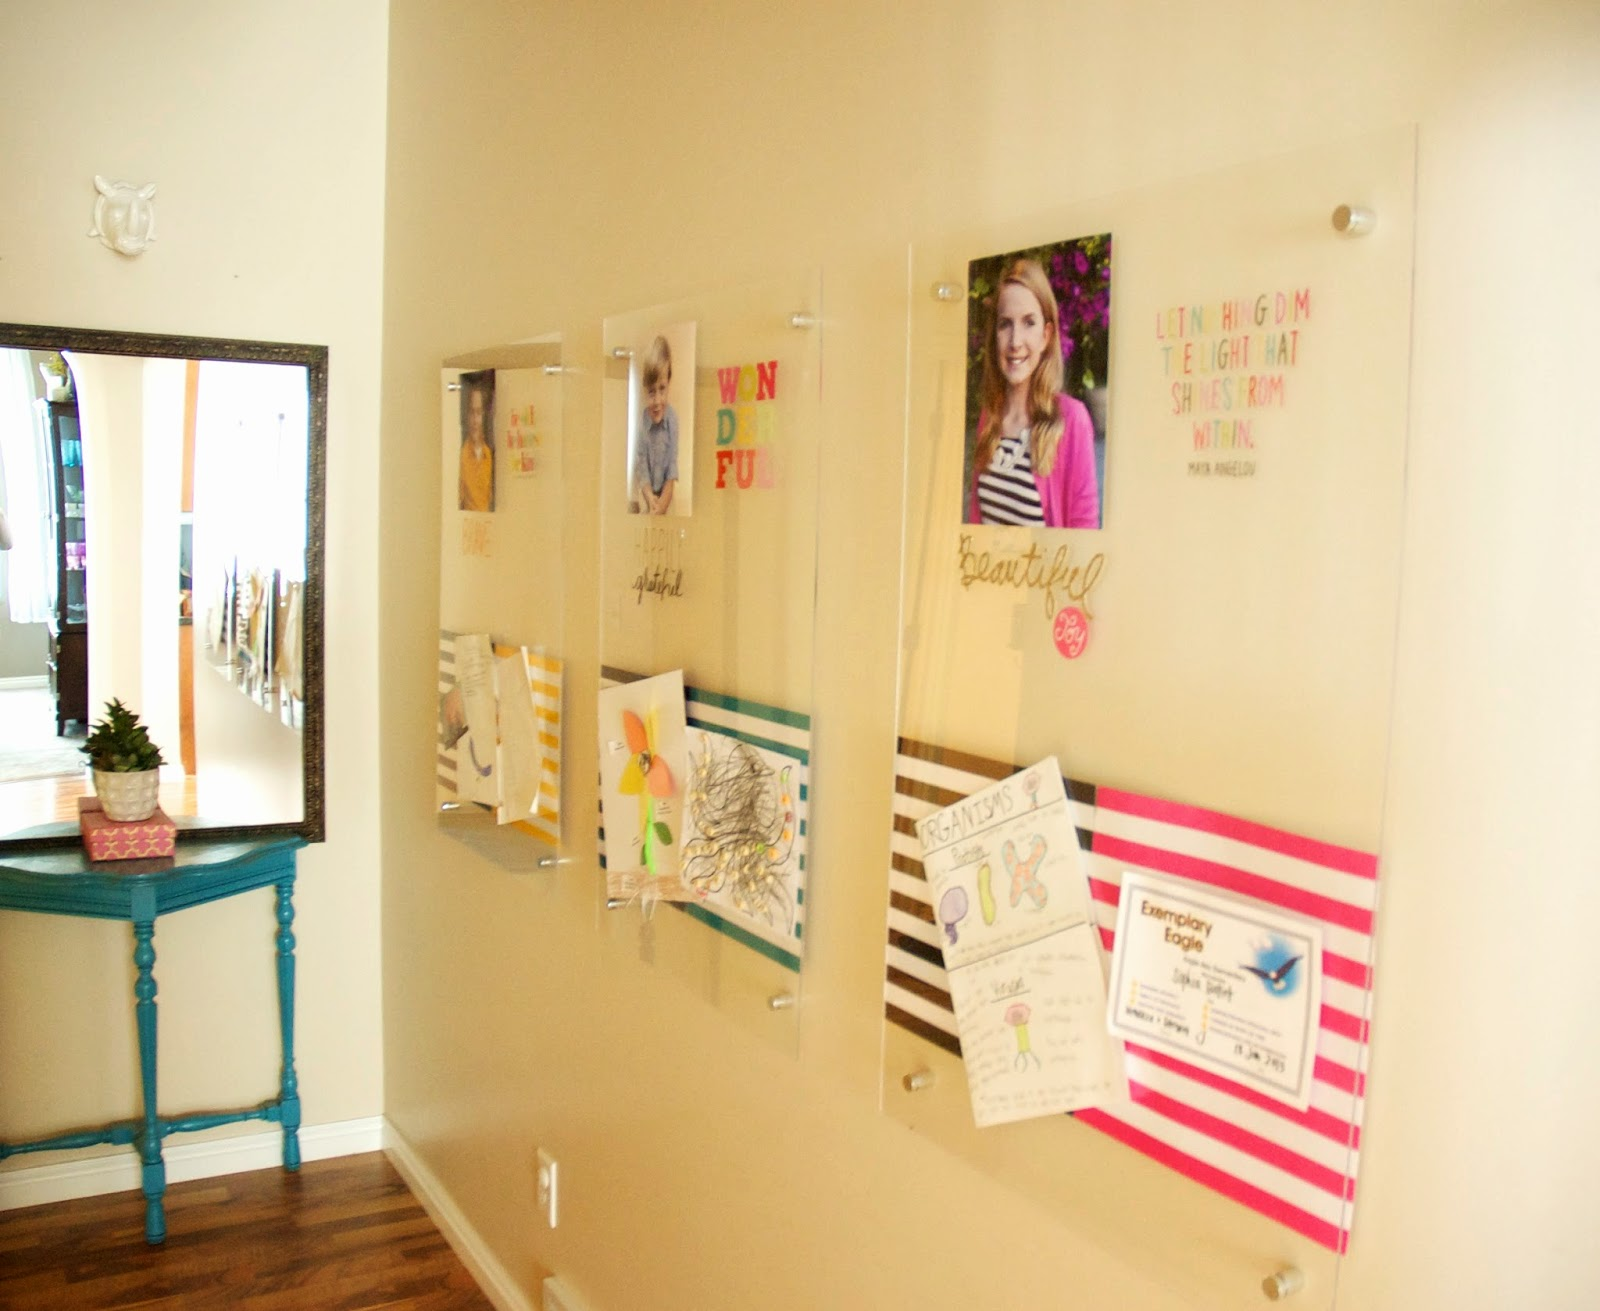 restlessrisa: Acrylic School Work Display DIY